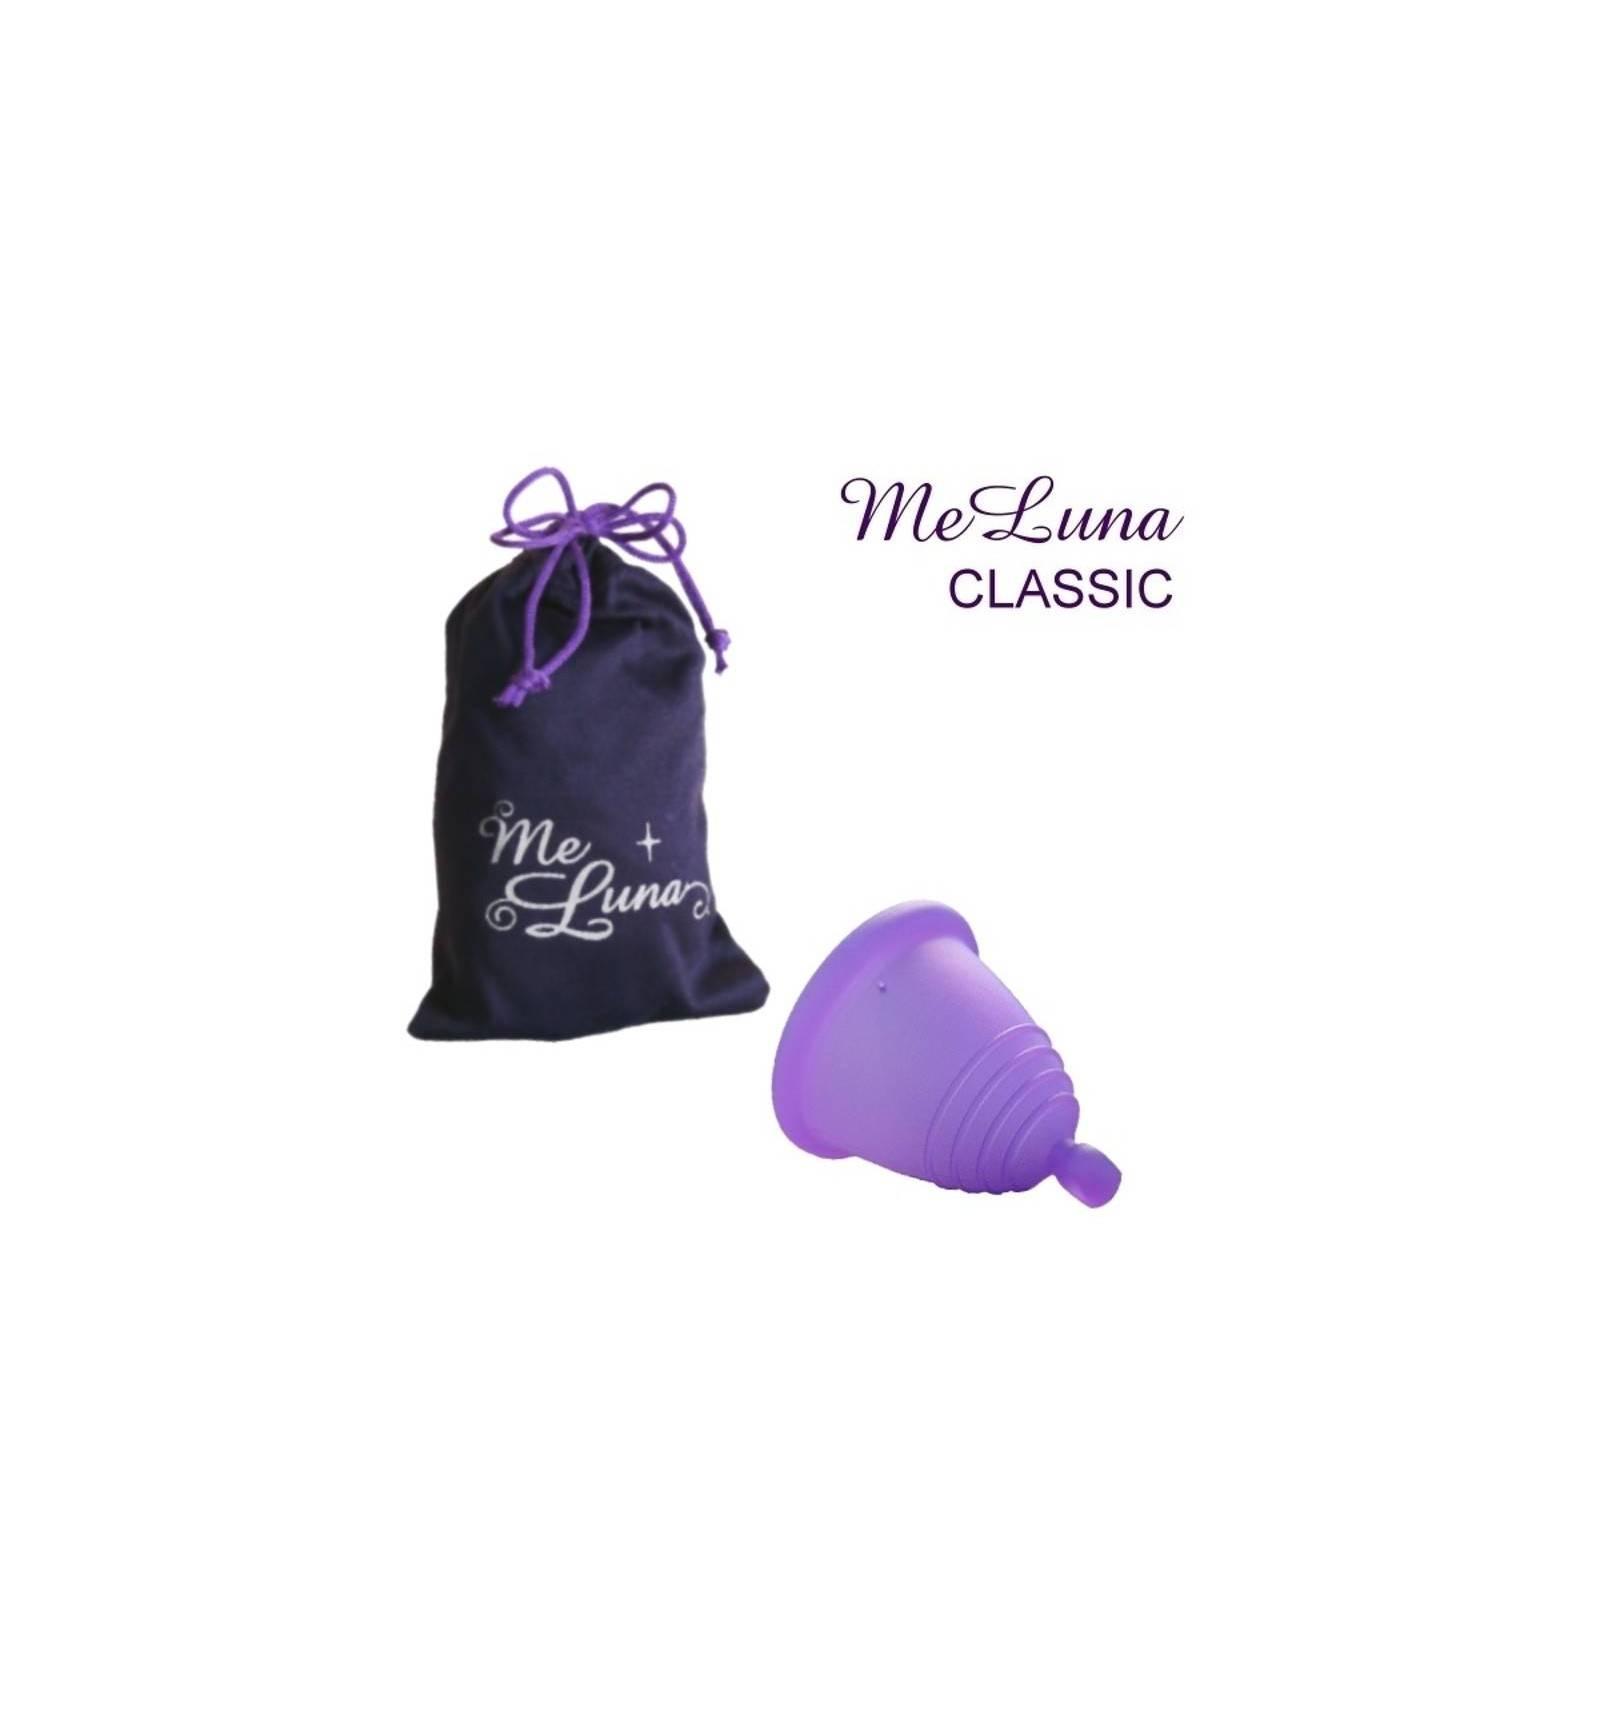 Copa menstrual MeLuna Shorty, Violeta, Classic, Bola